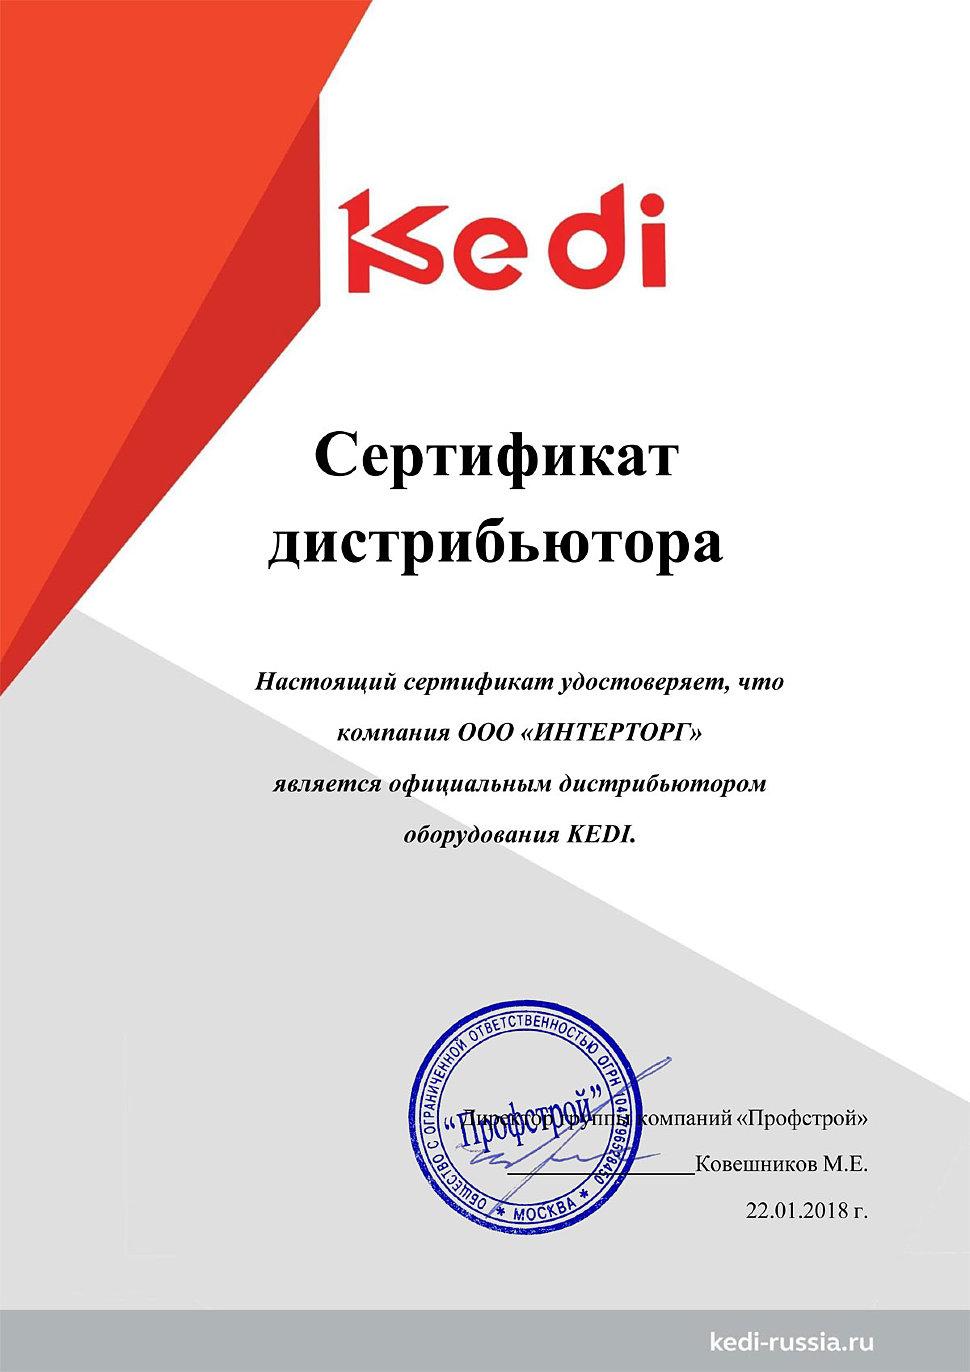 Сертификат KEDI